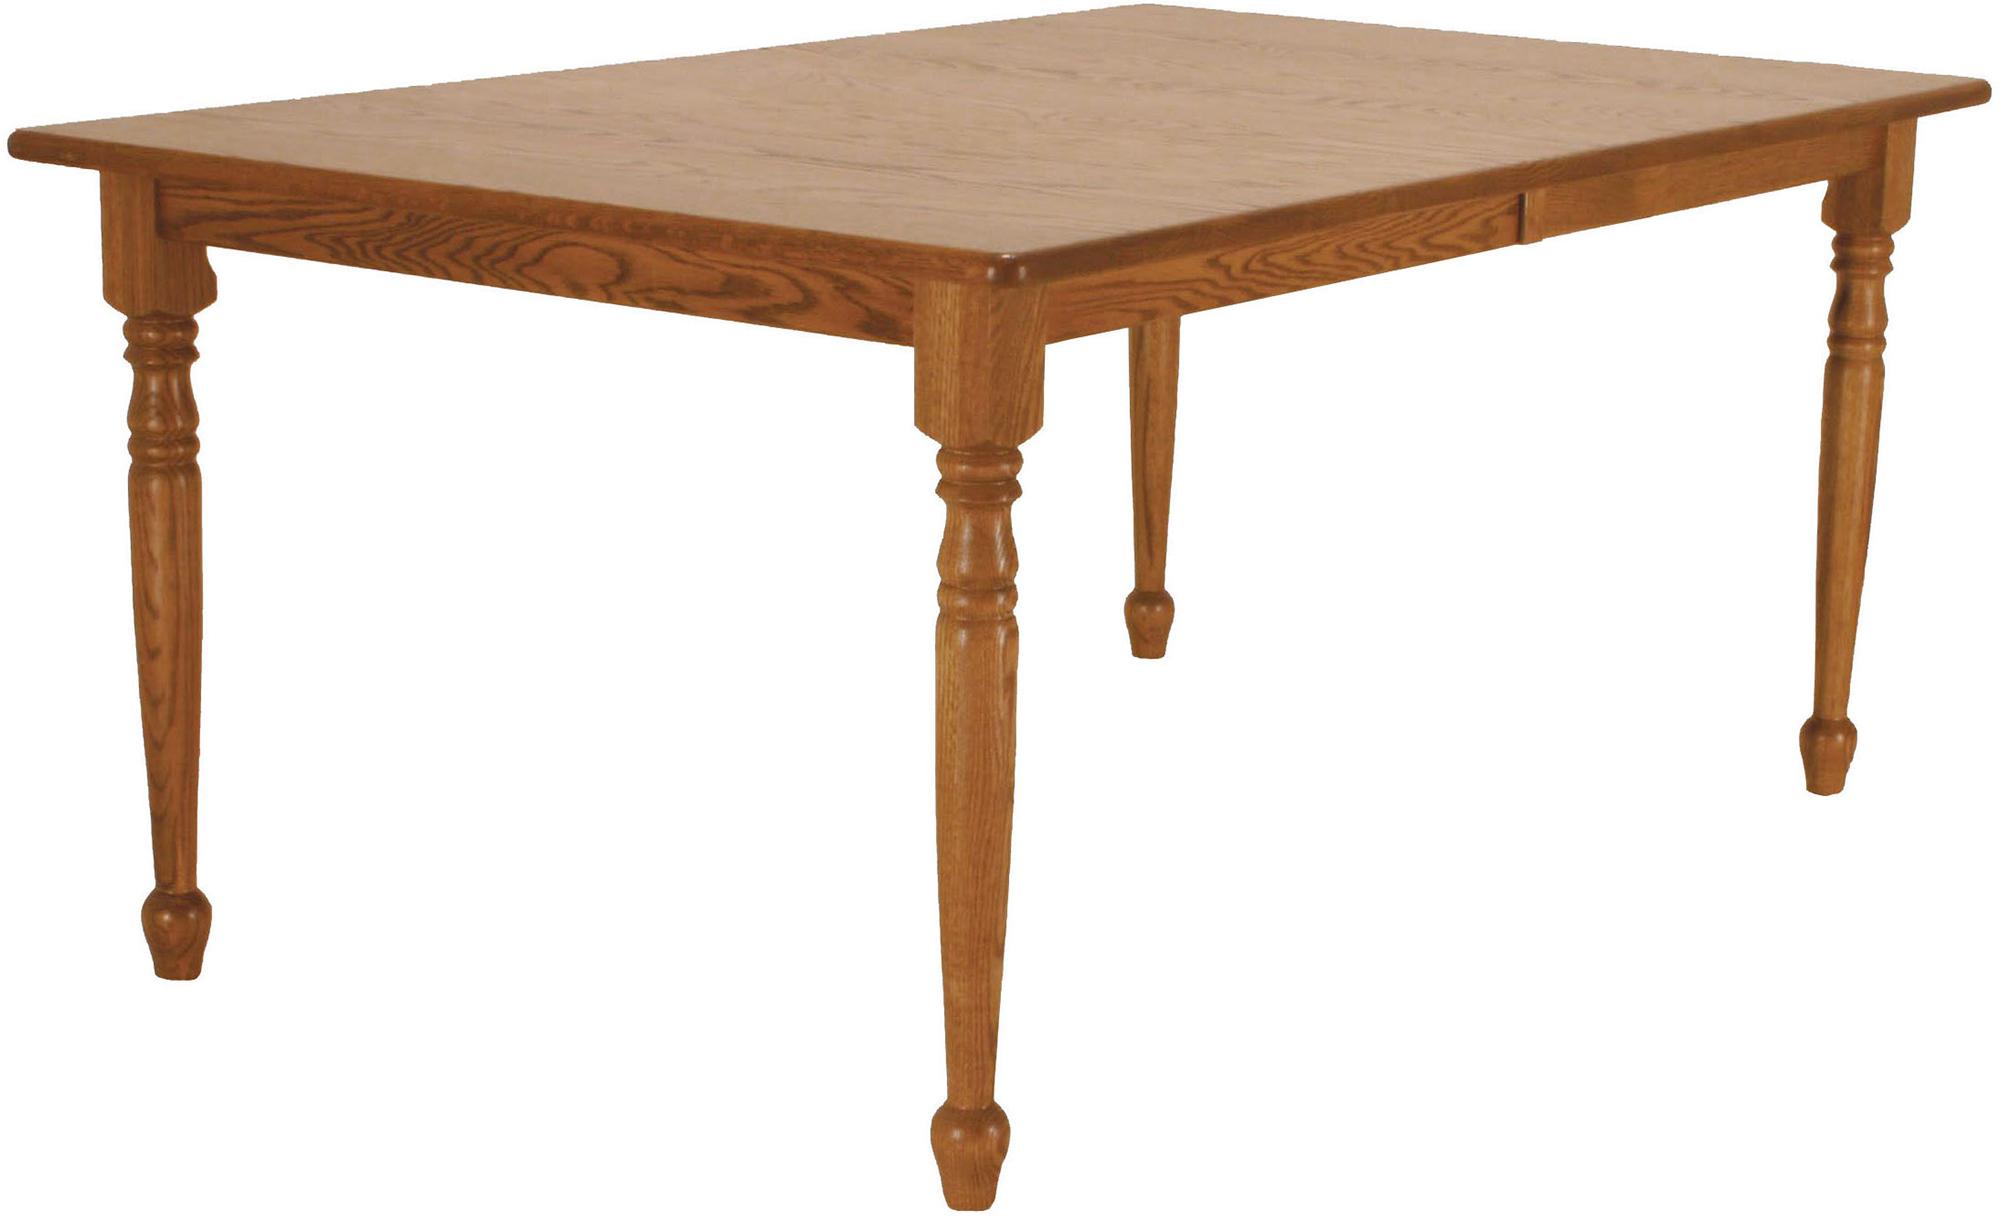 https://www.weaverfurnituresales.com/wp-content/uploads/2018/01/harvest-dining-table.jpg